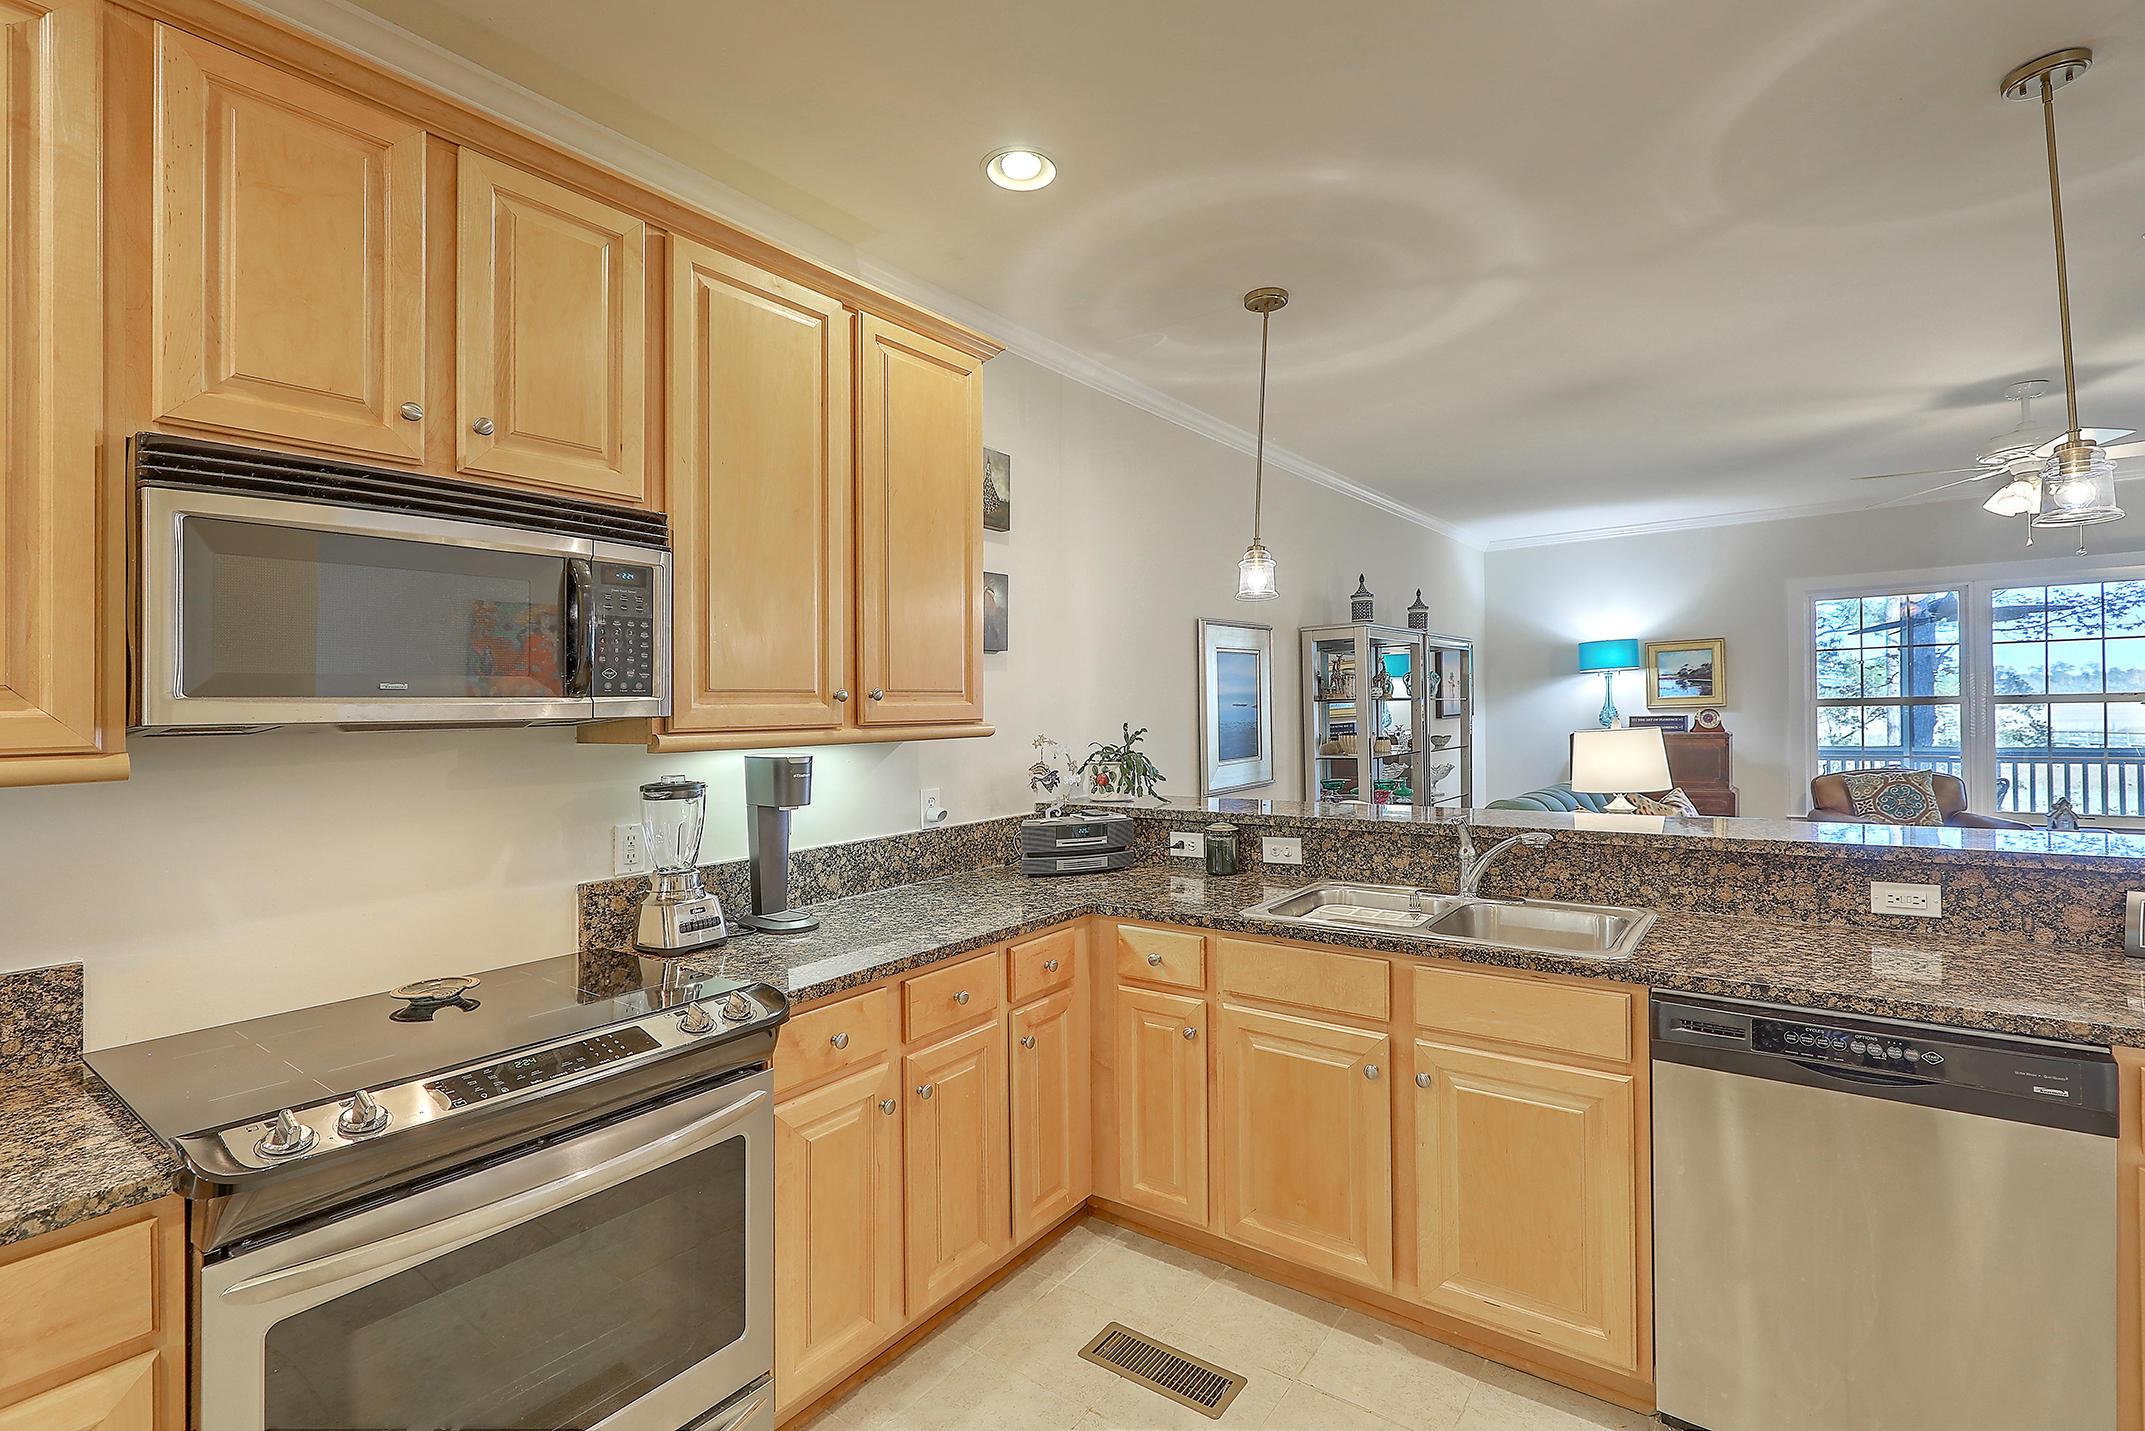 Etiwan Pointe Homes For Sale - 124 Winding Creek, Mount Pleasant, SC - 26